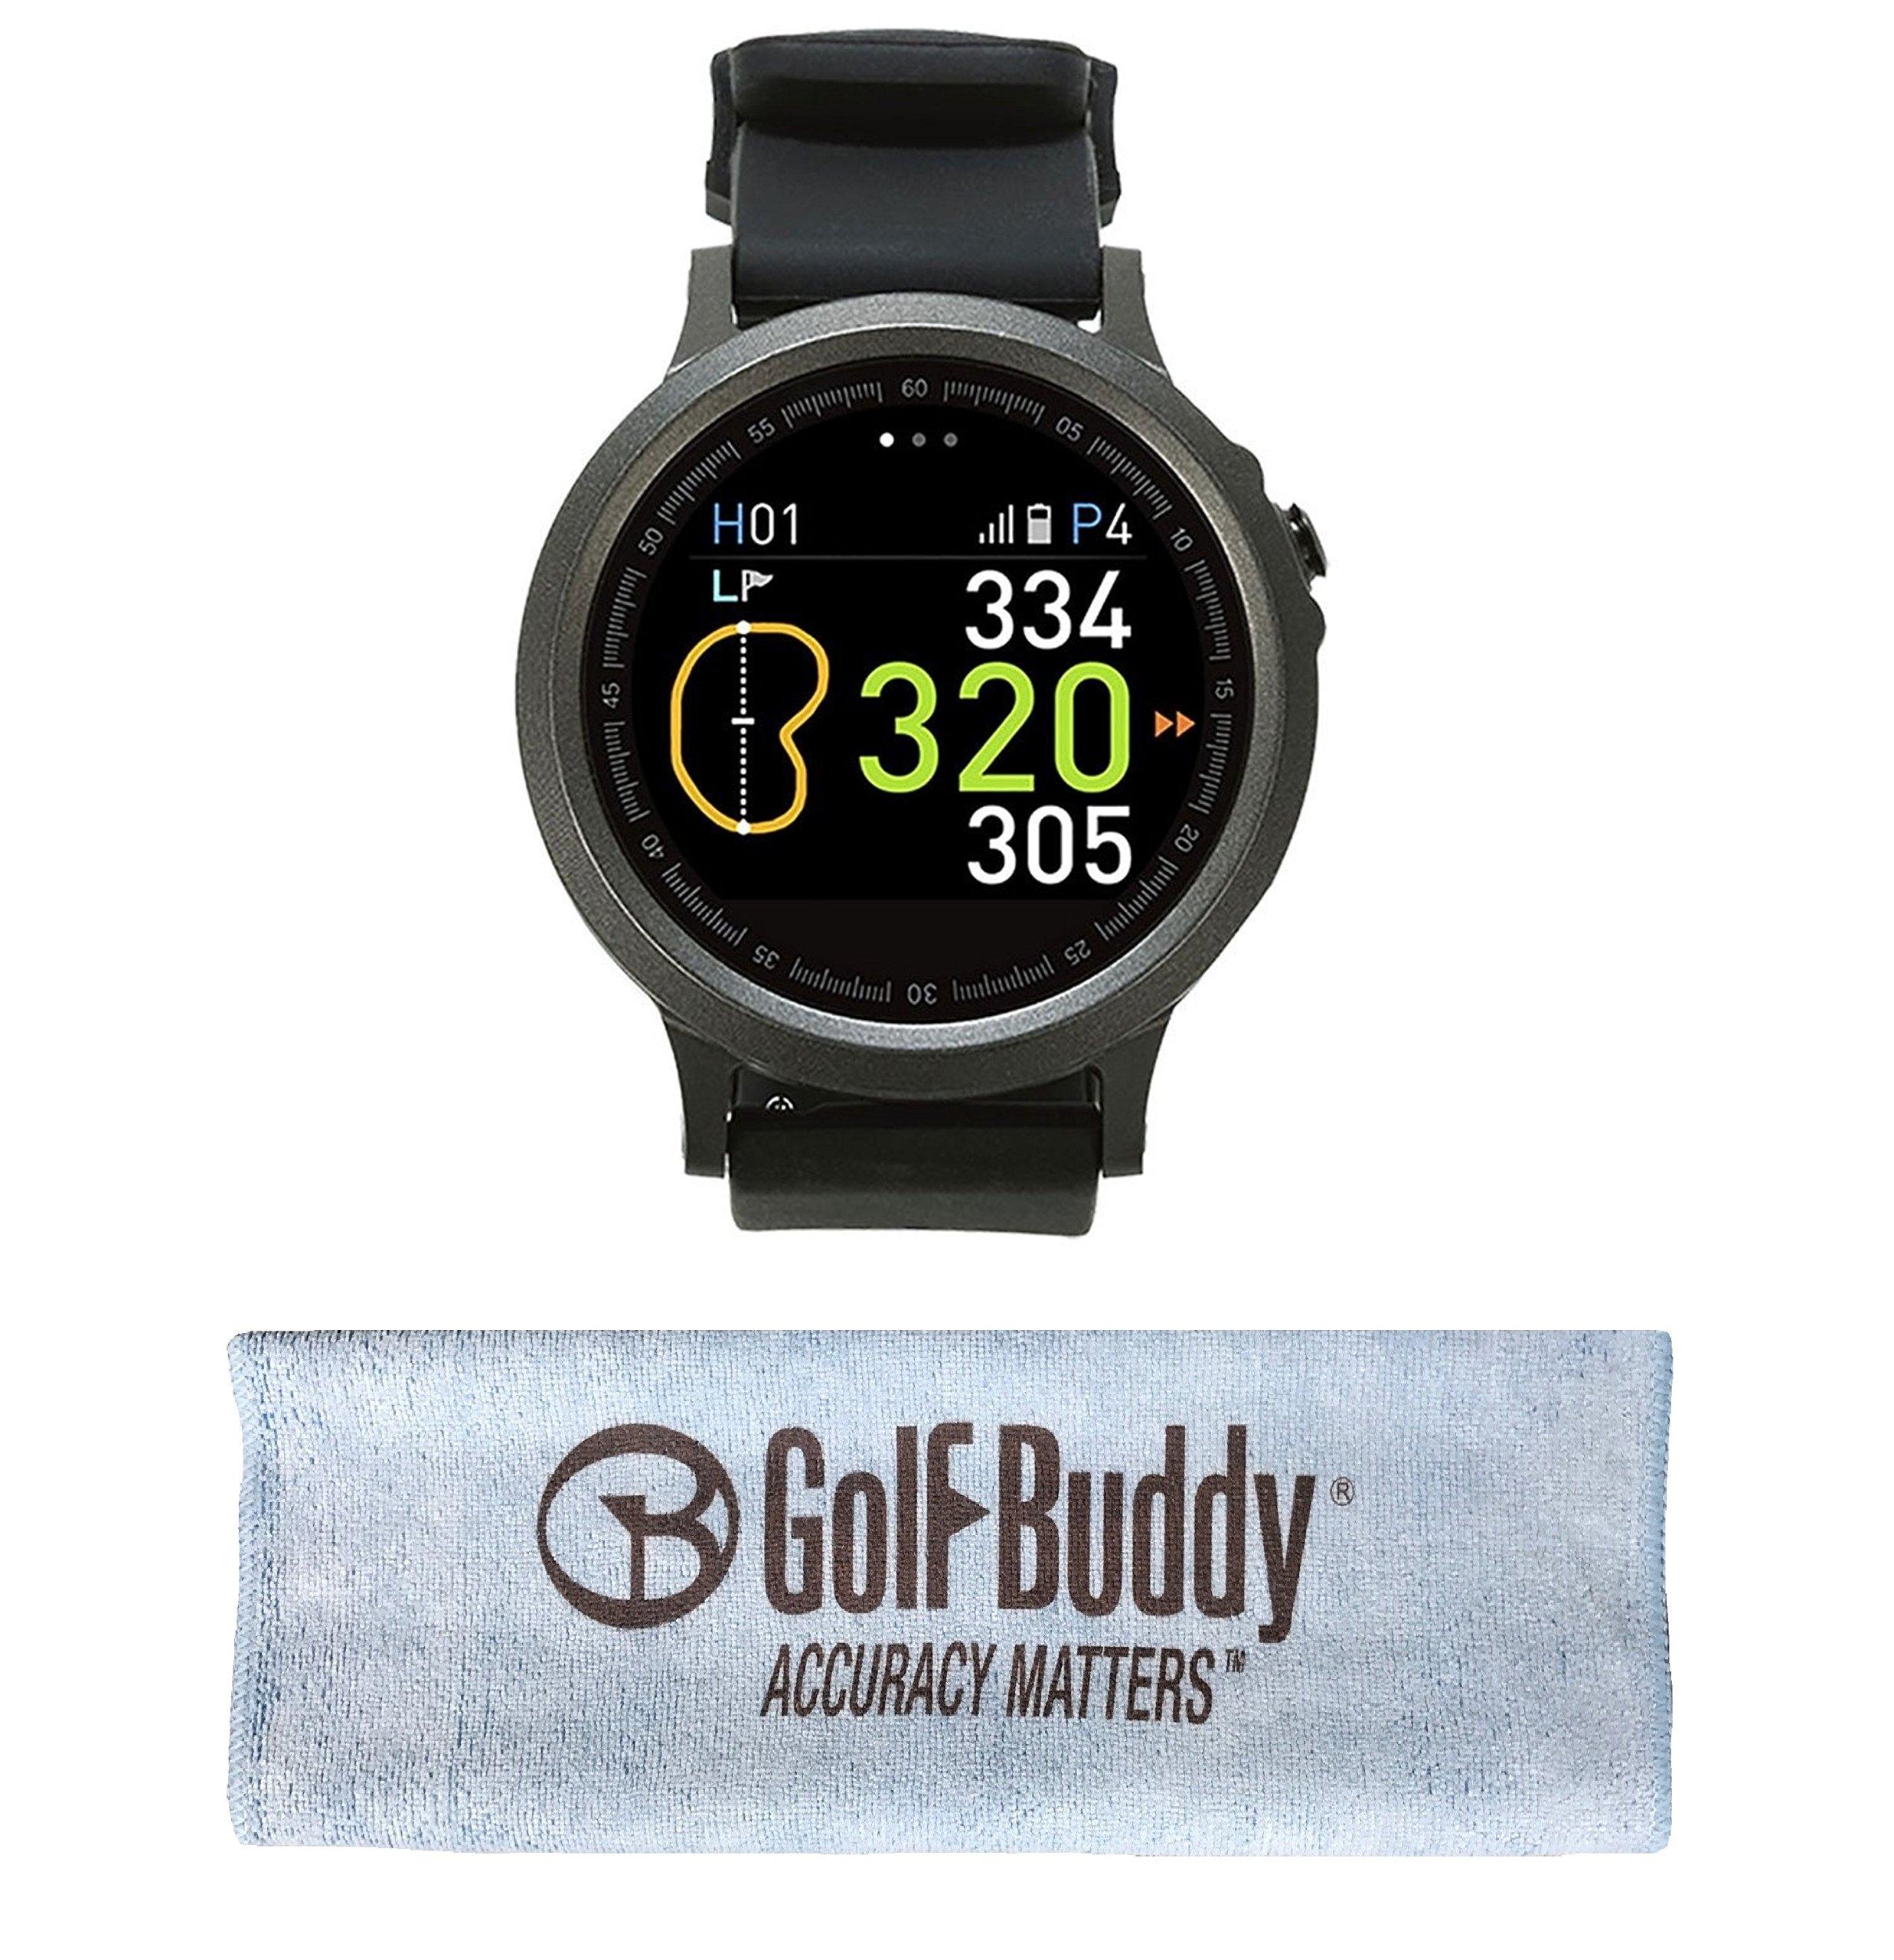 GolfBuddy WTX Smart Golf GPS Watch Black with Bonus Golf Buddy Microfiber Towel